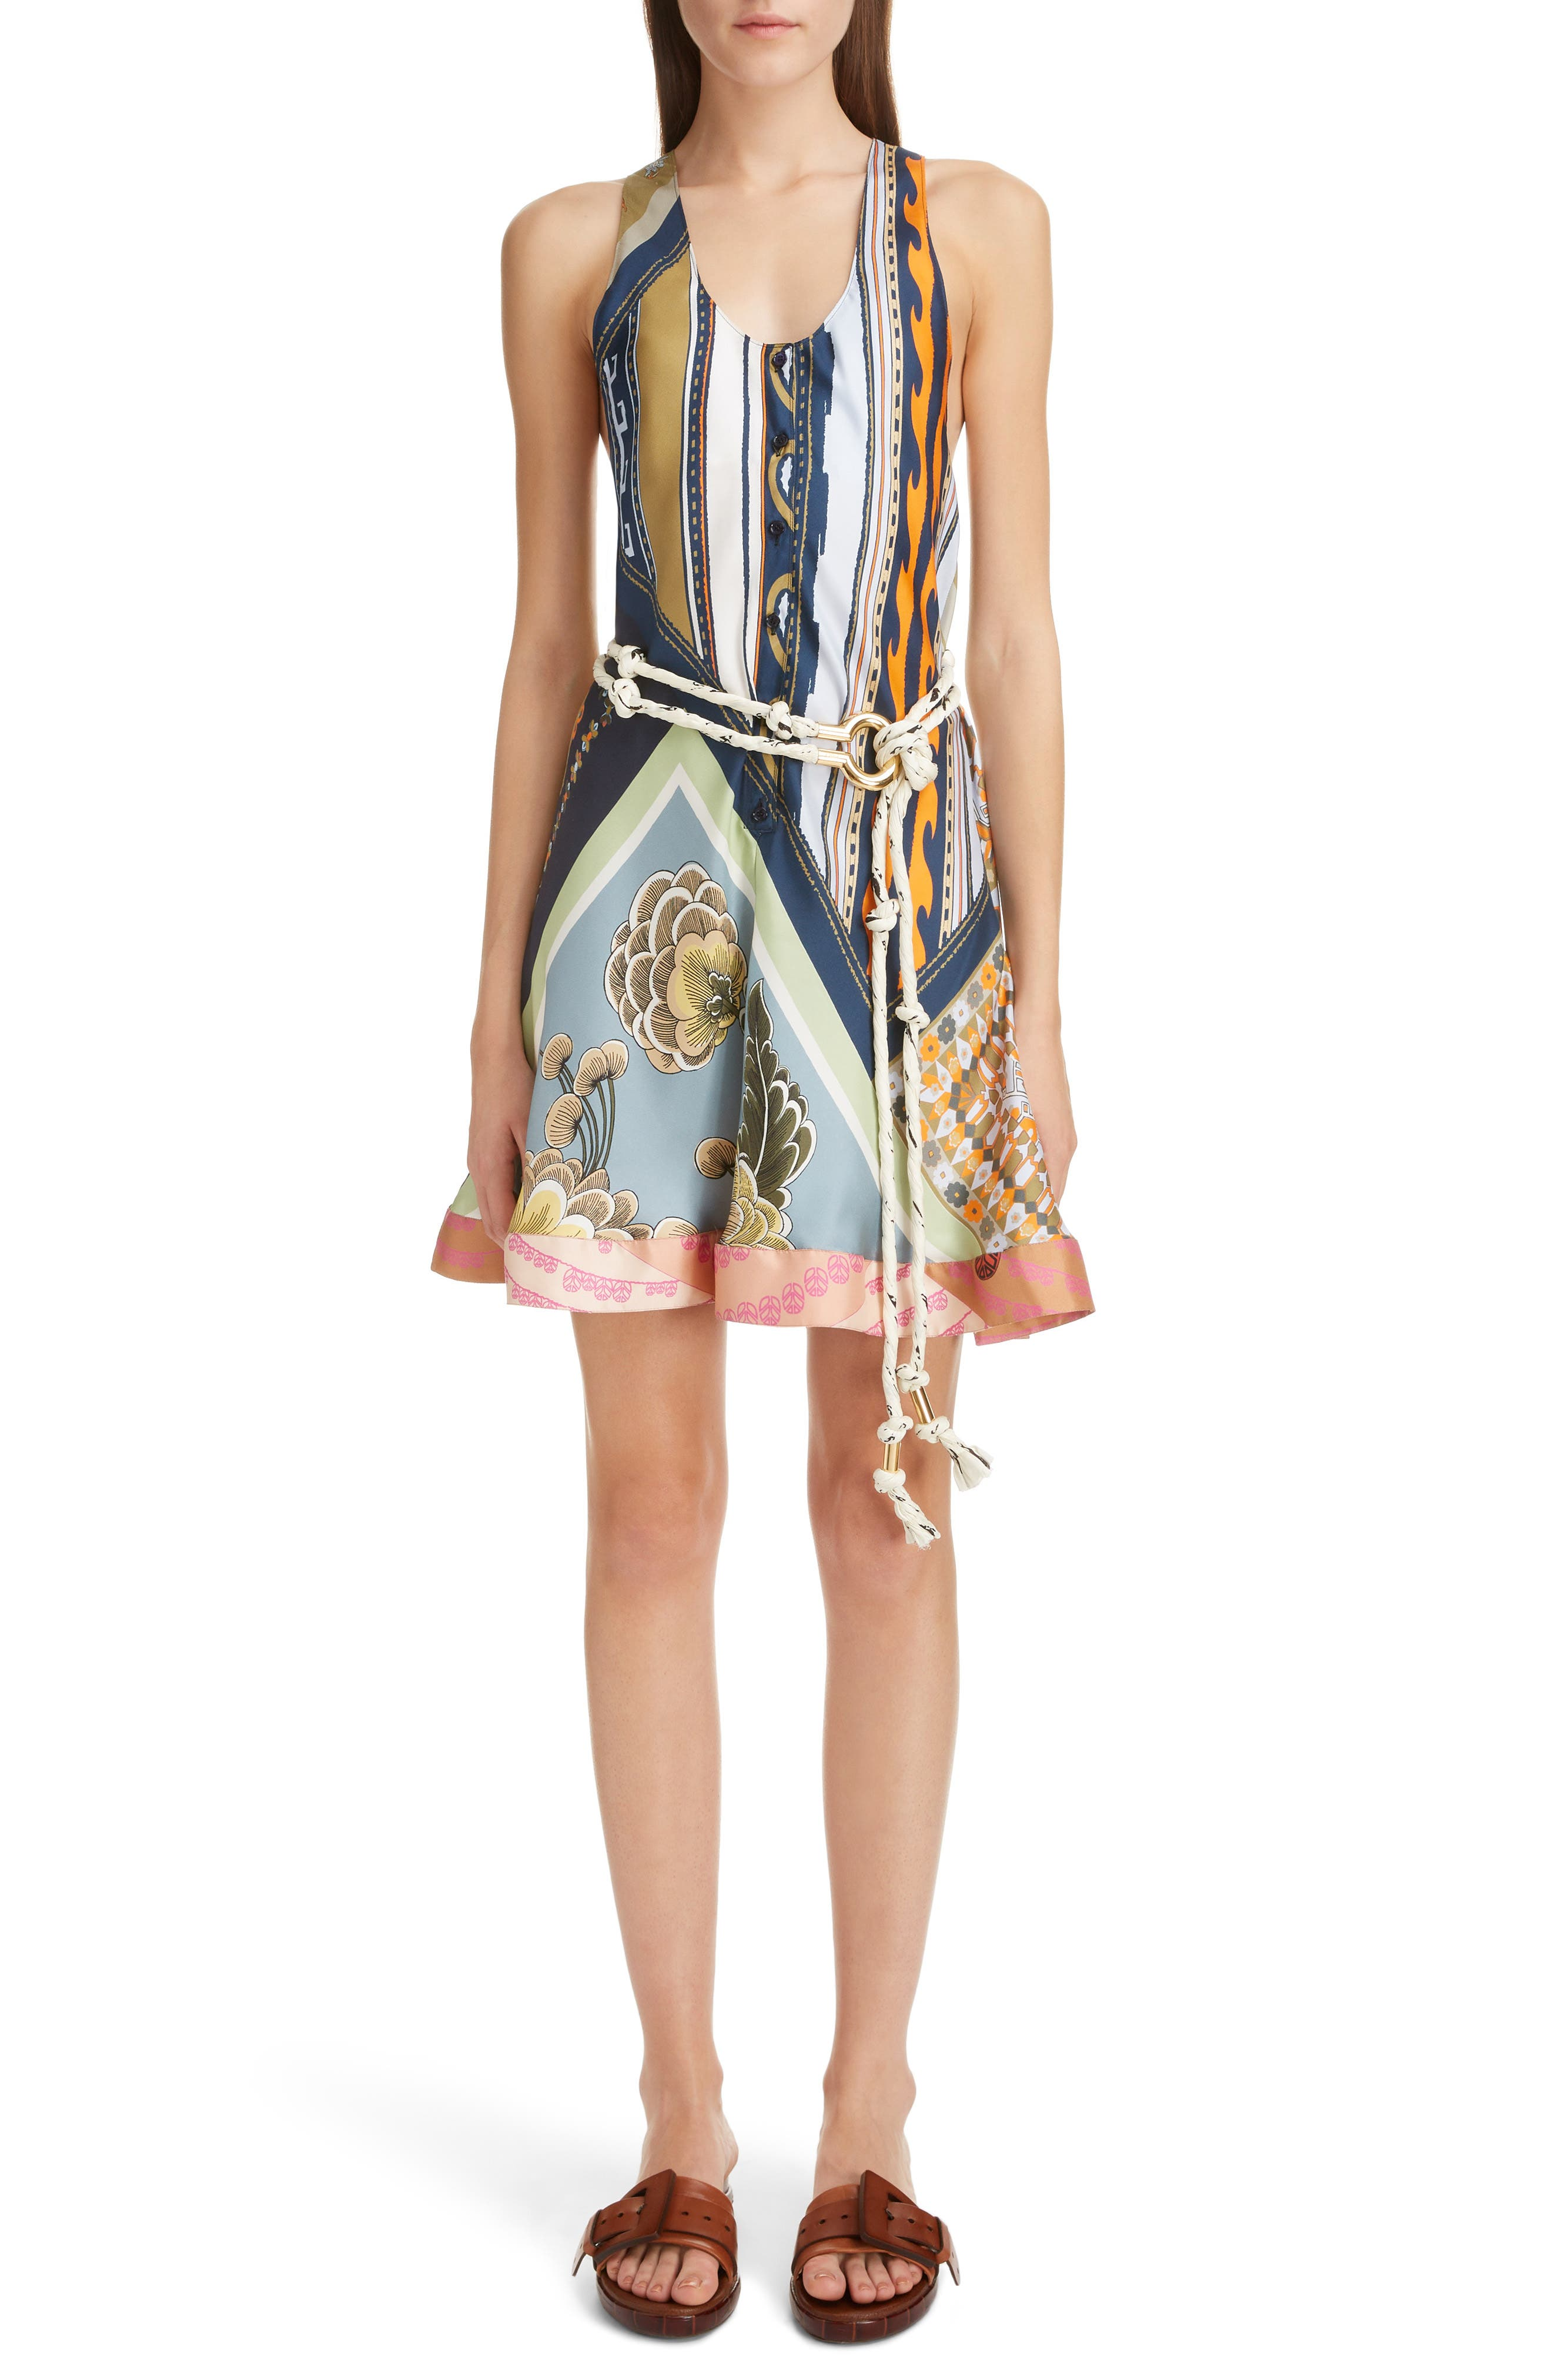 CHLOÉ Caravan Print Silk Racerback Dress, Main, color, MULTICOLOR BLUE